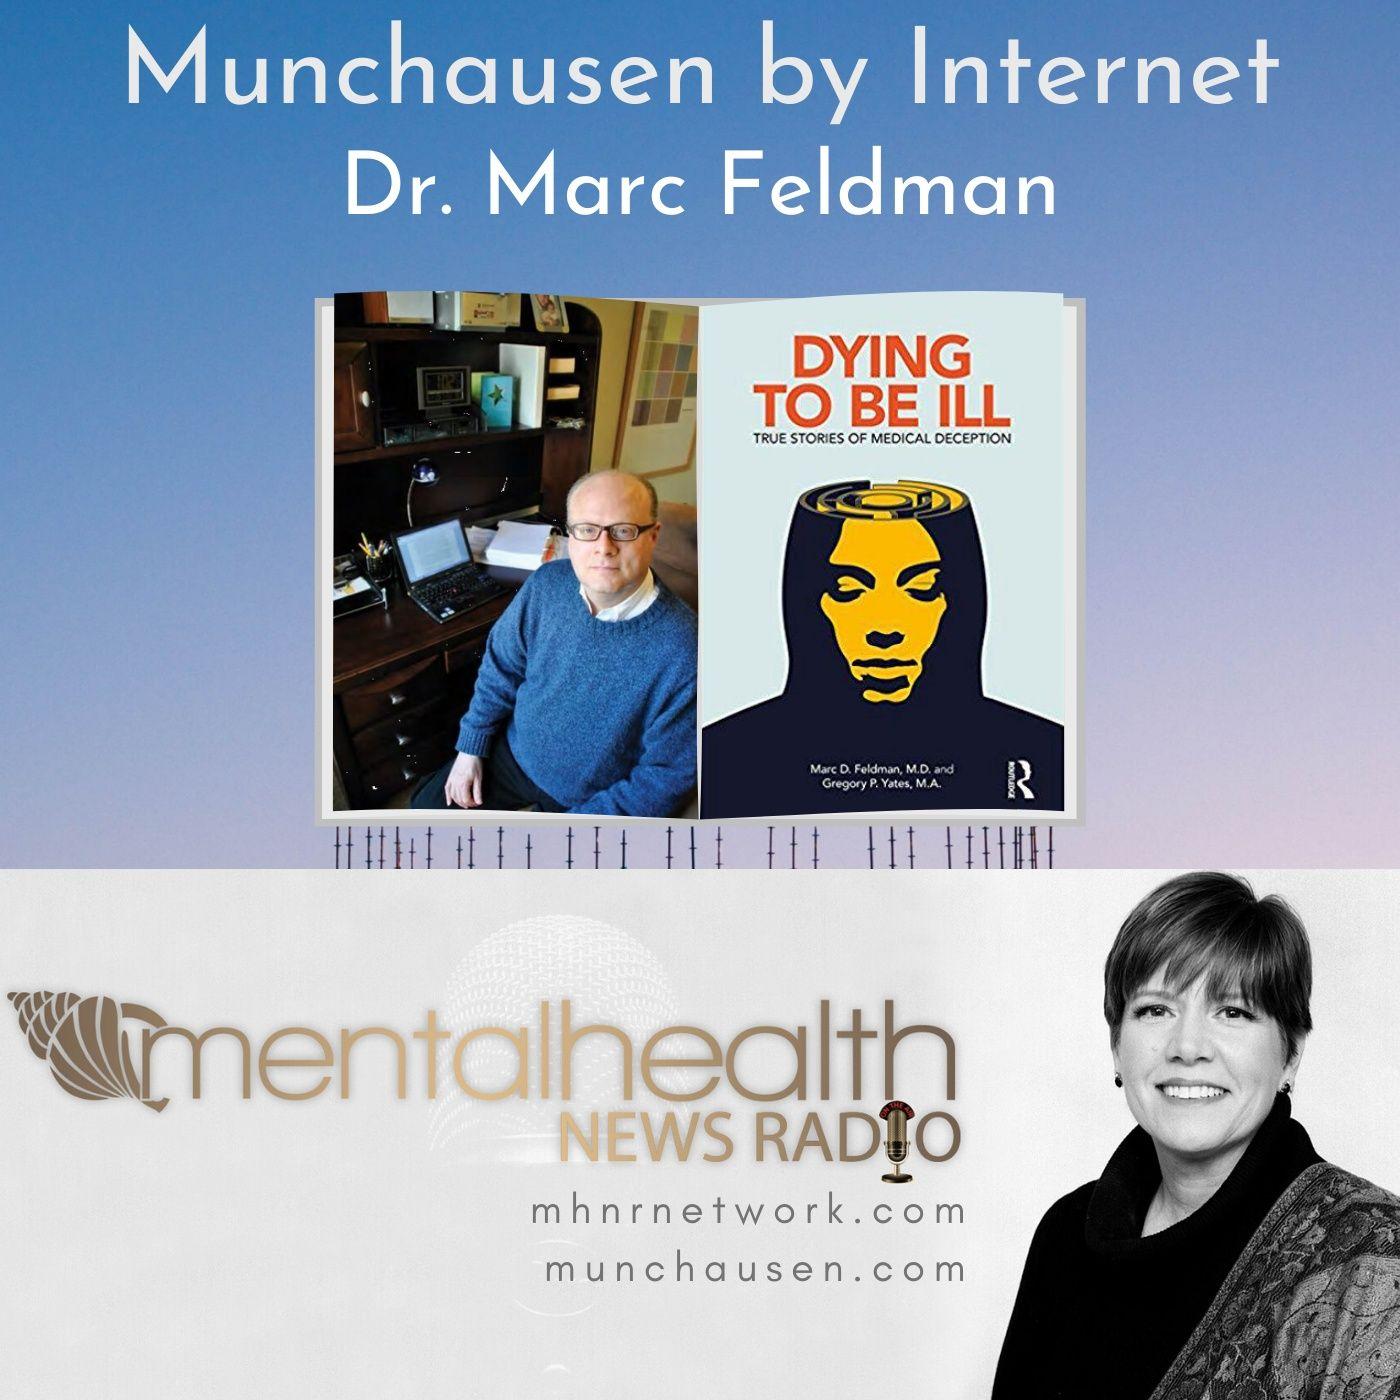 Mental Health News Radio - Munchausen by Internet with Dr. Marc Feldman